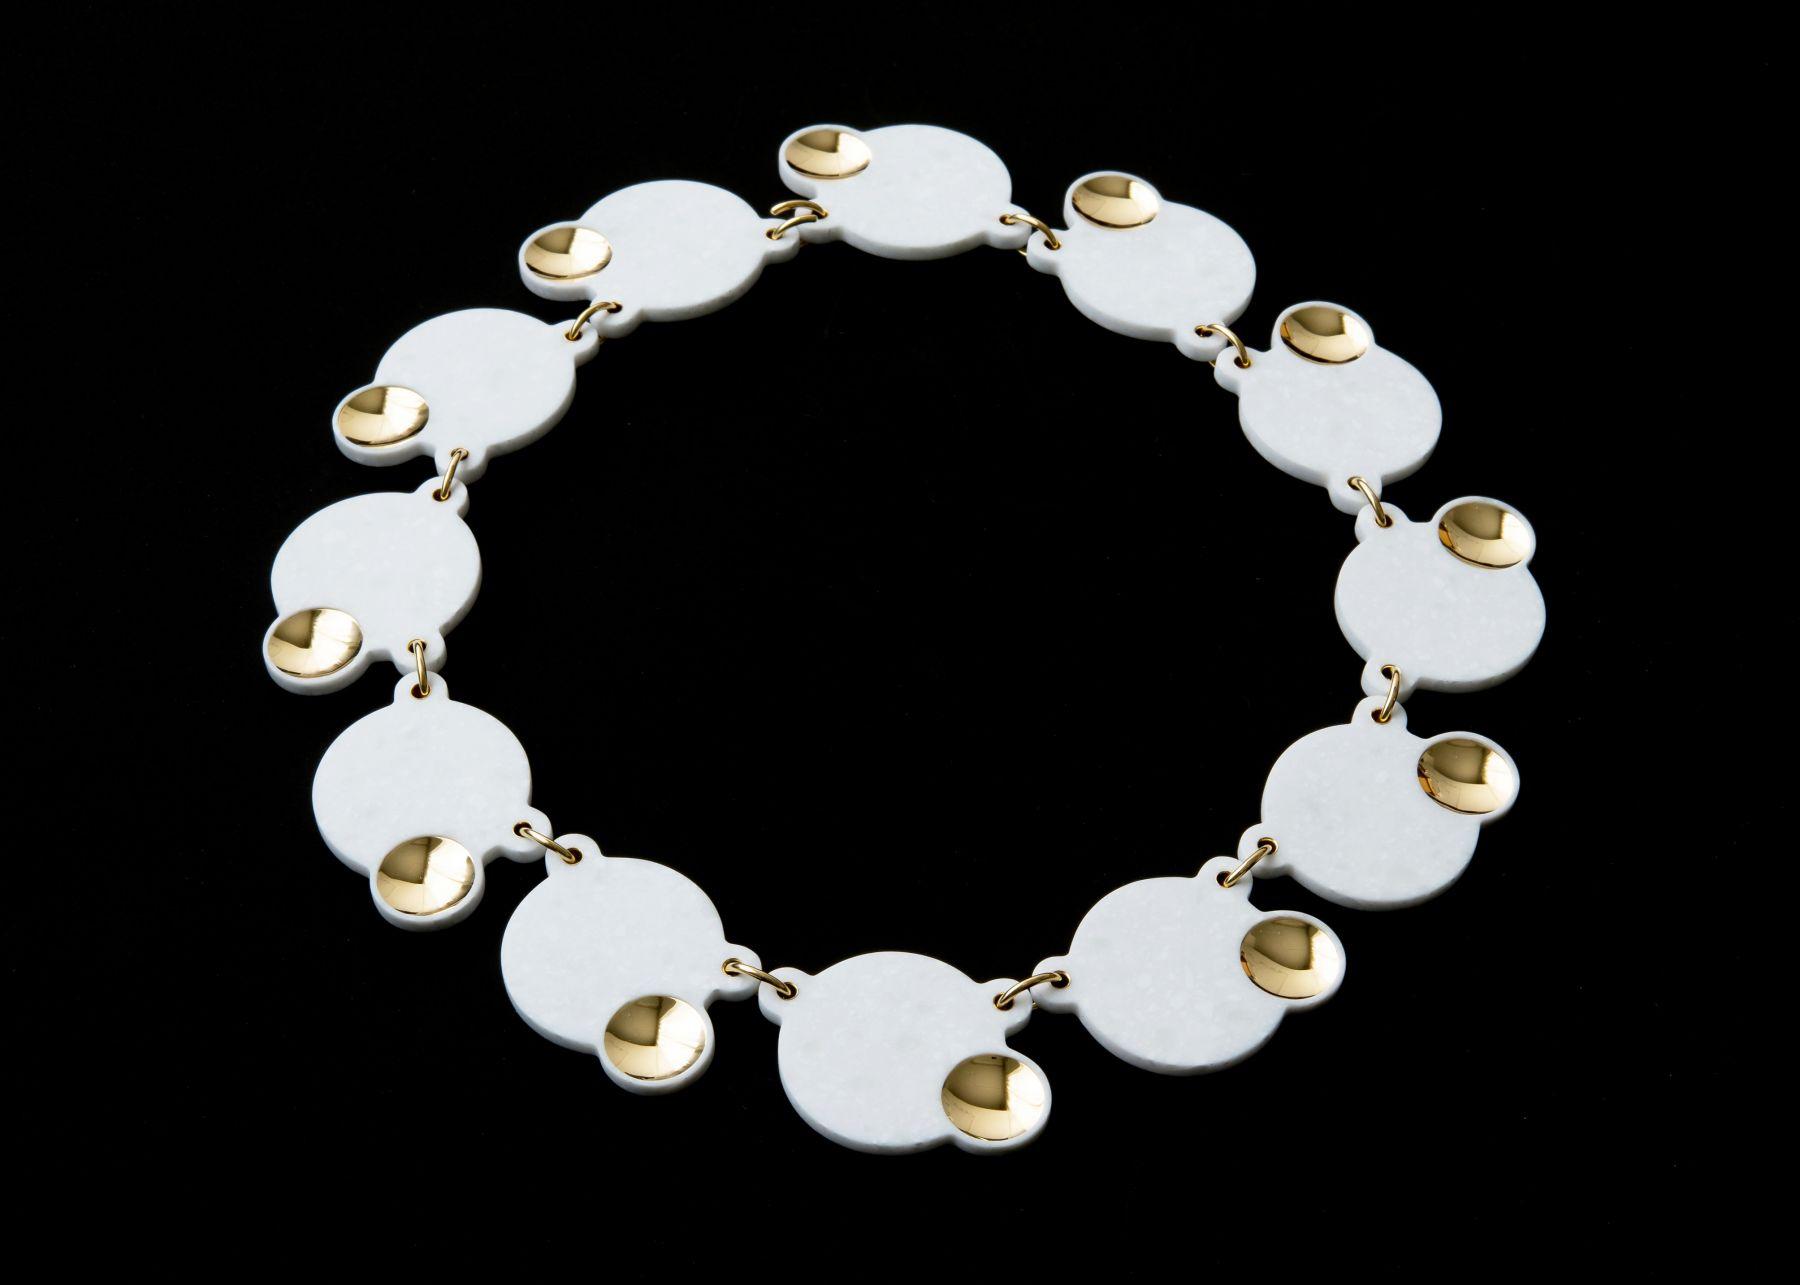 Jiro Kamata, Flare, necklace